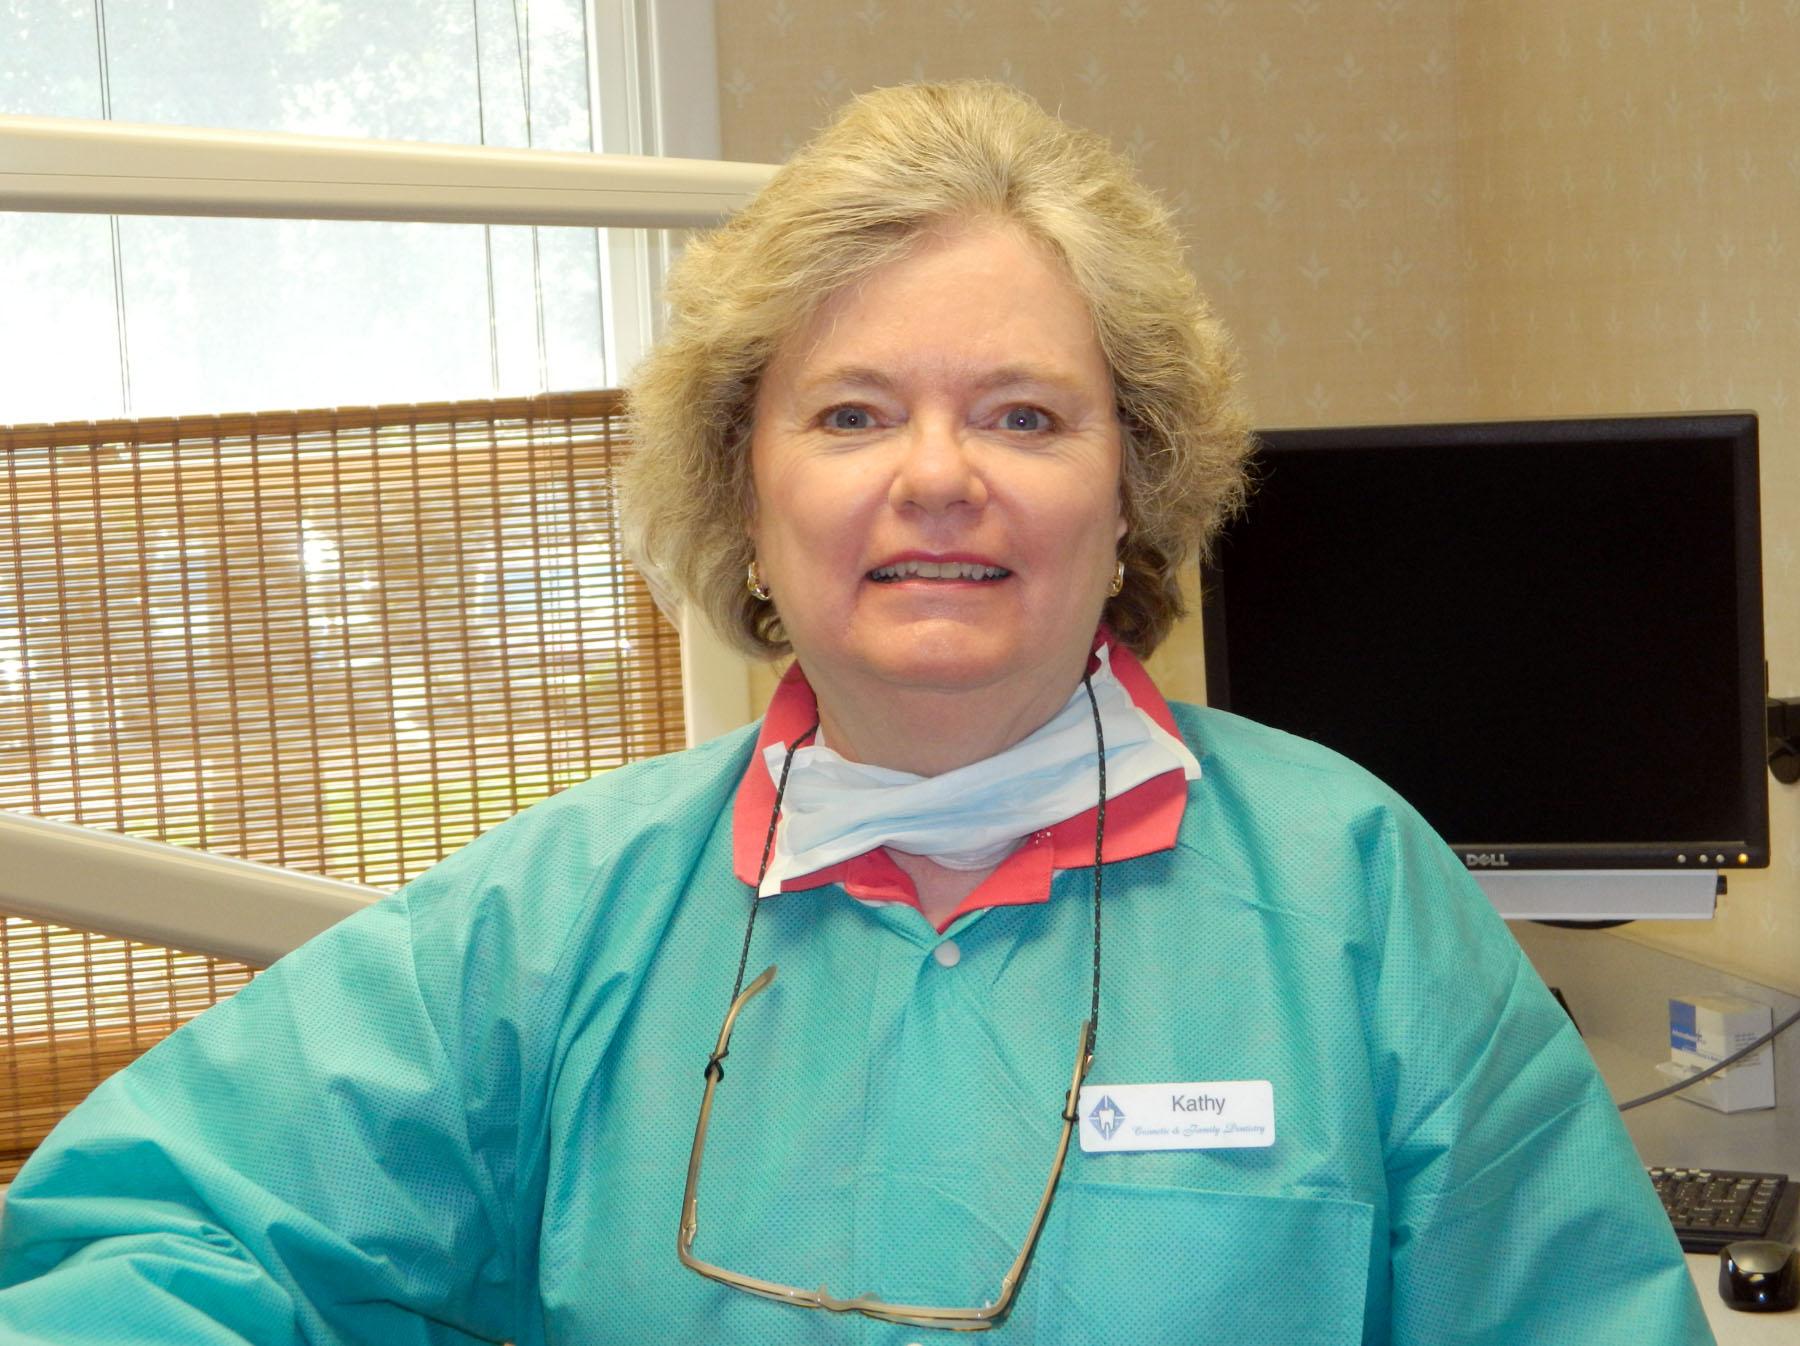 dr-baum-dentist-kathy-montone-dental-assistant